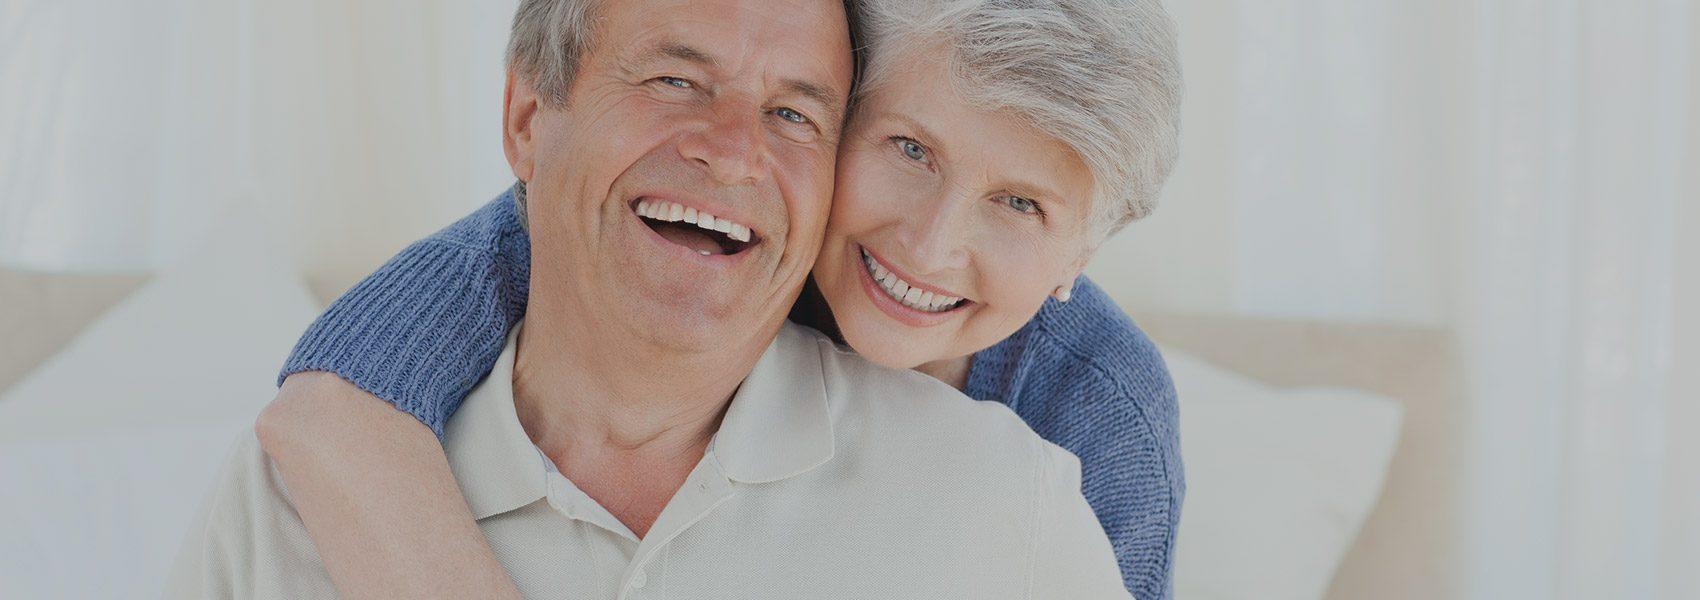 Teeth Whitening - Distinctive Dentistry